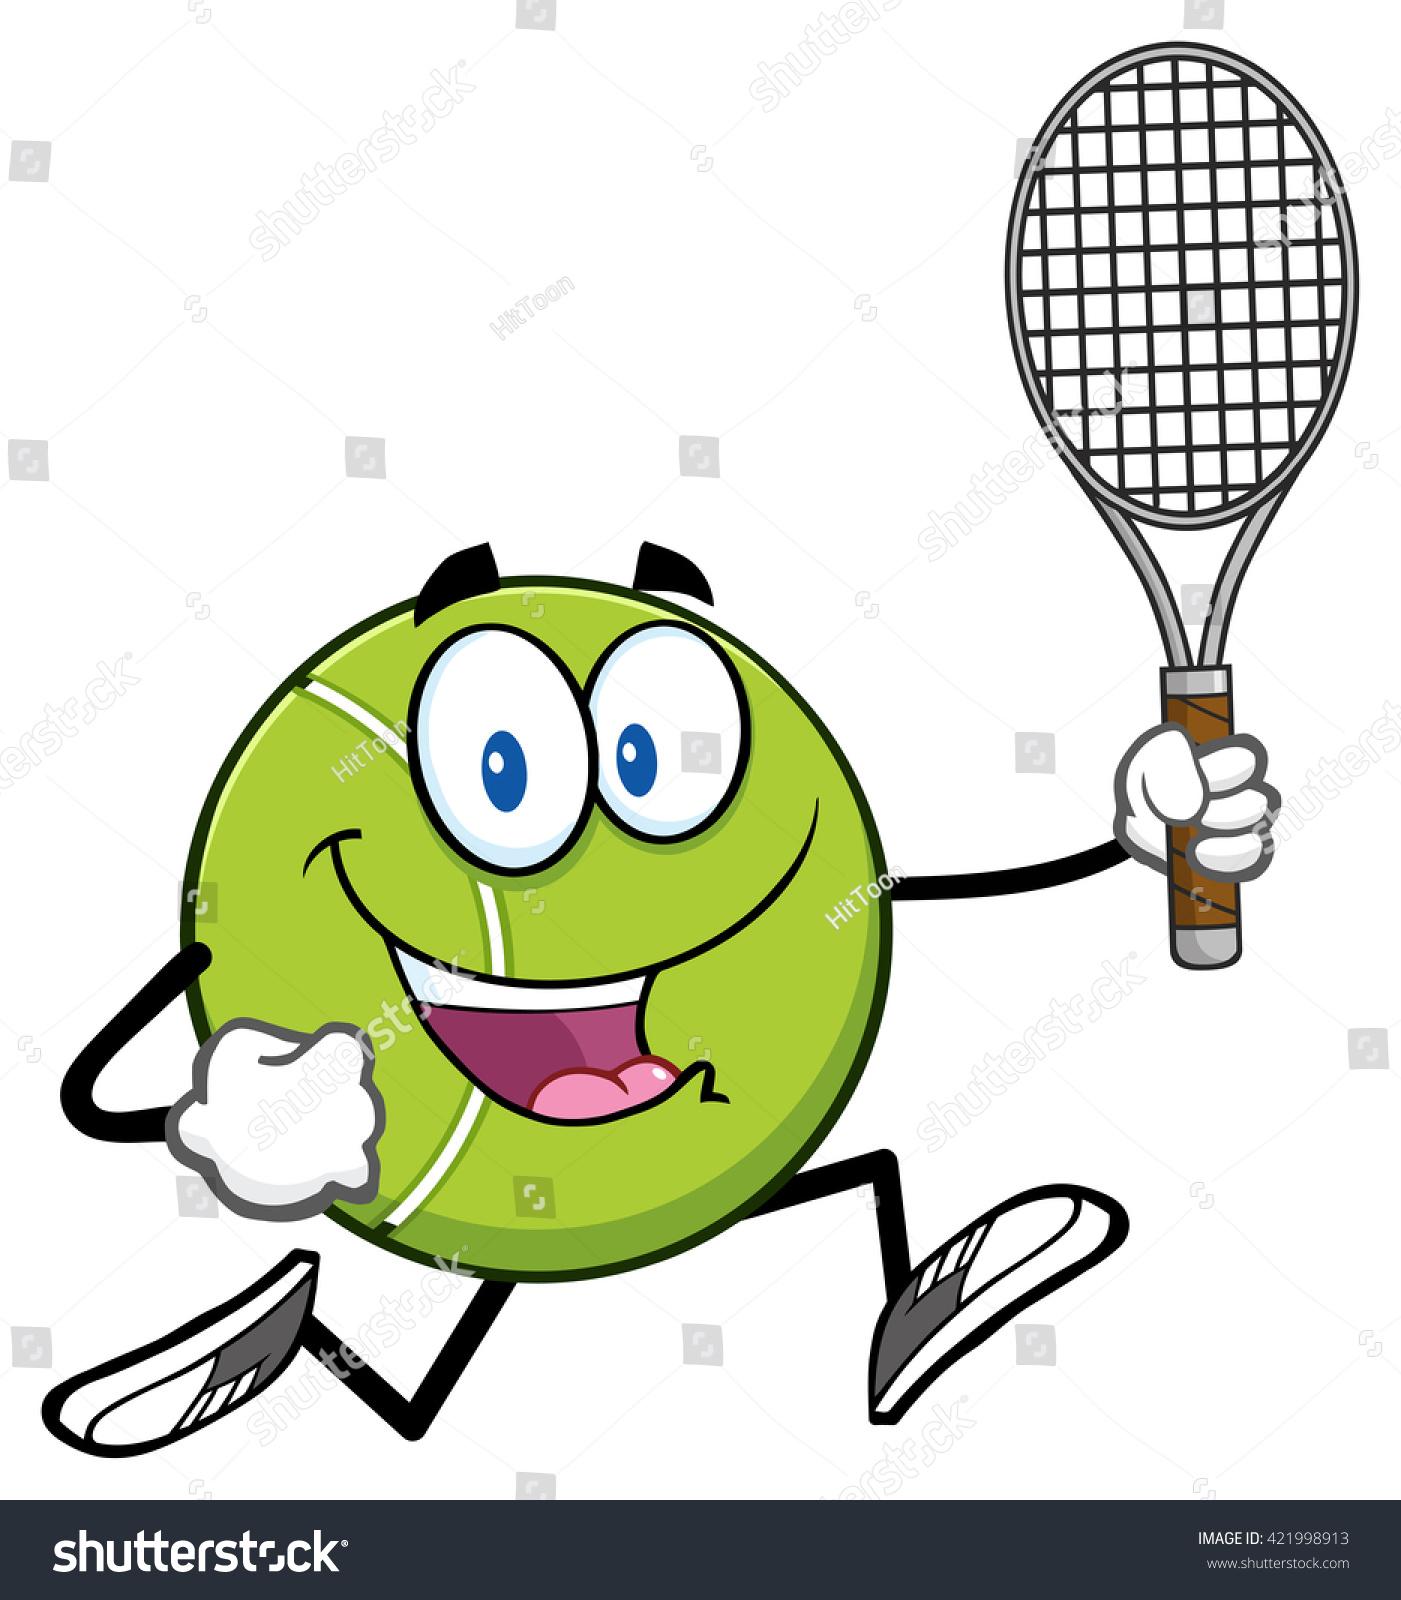 Tennis ball mascot stock photos tennis ball mascot stock photography - Tennis Ball Cartoon Character Running With Racket Raster Illustration Isolated On White